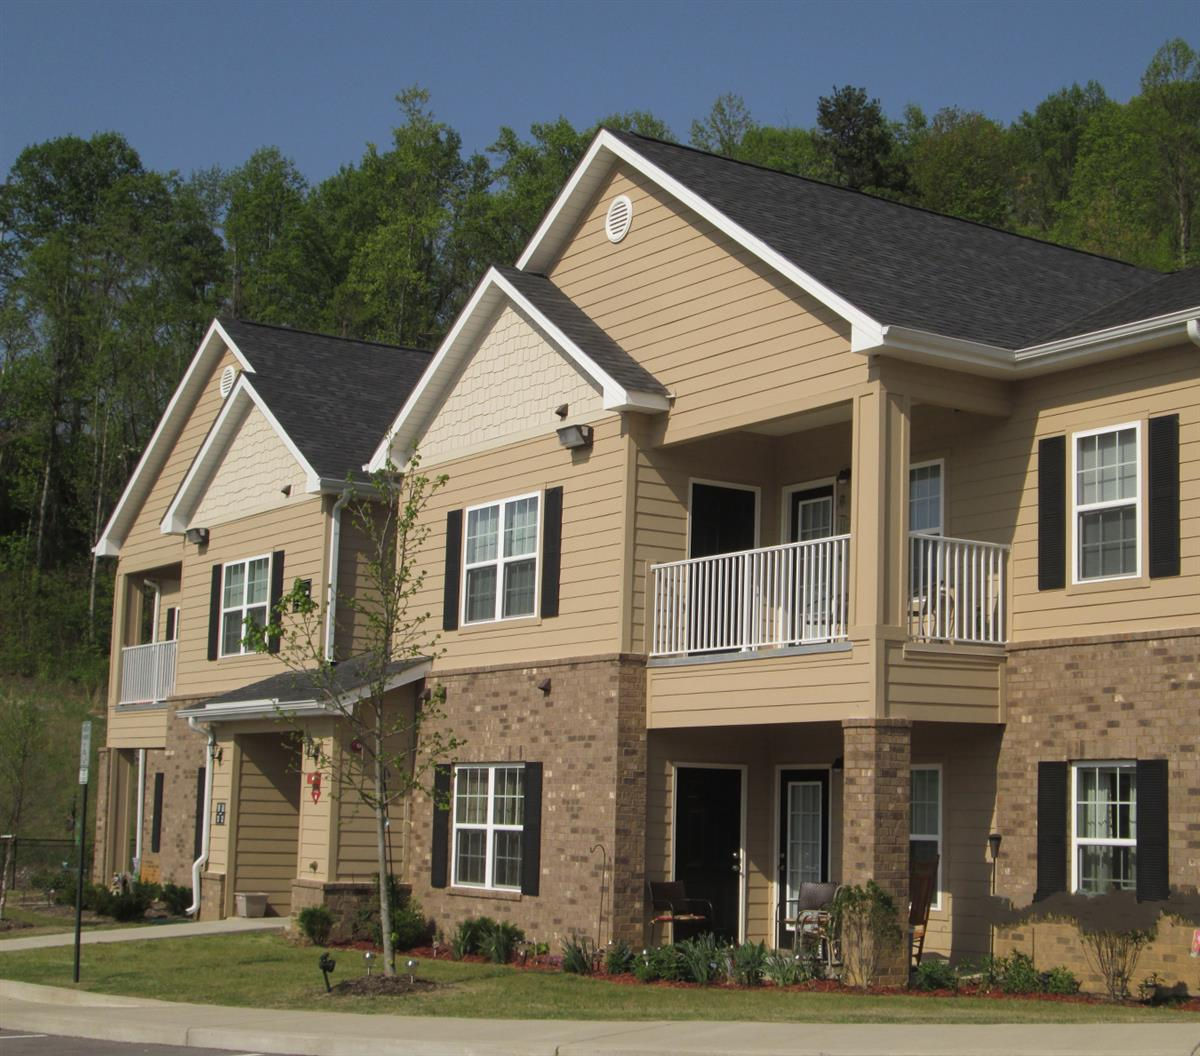 Efficiency Apartments Rent